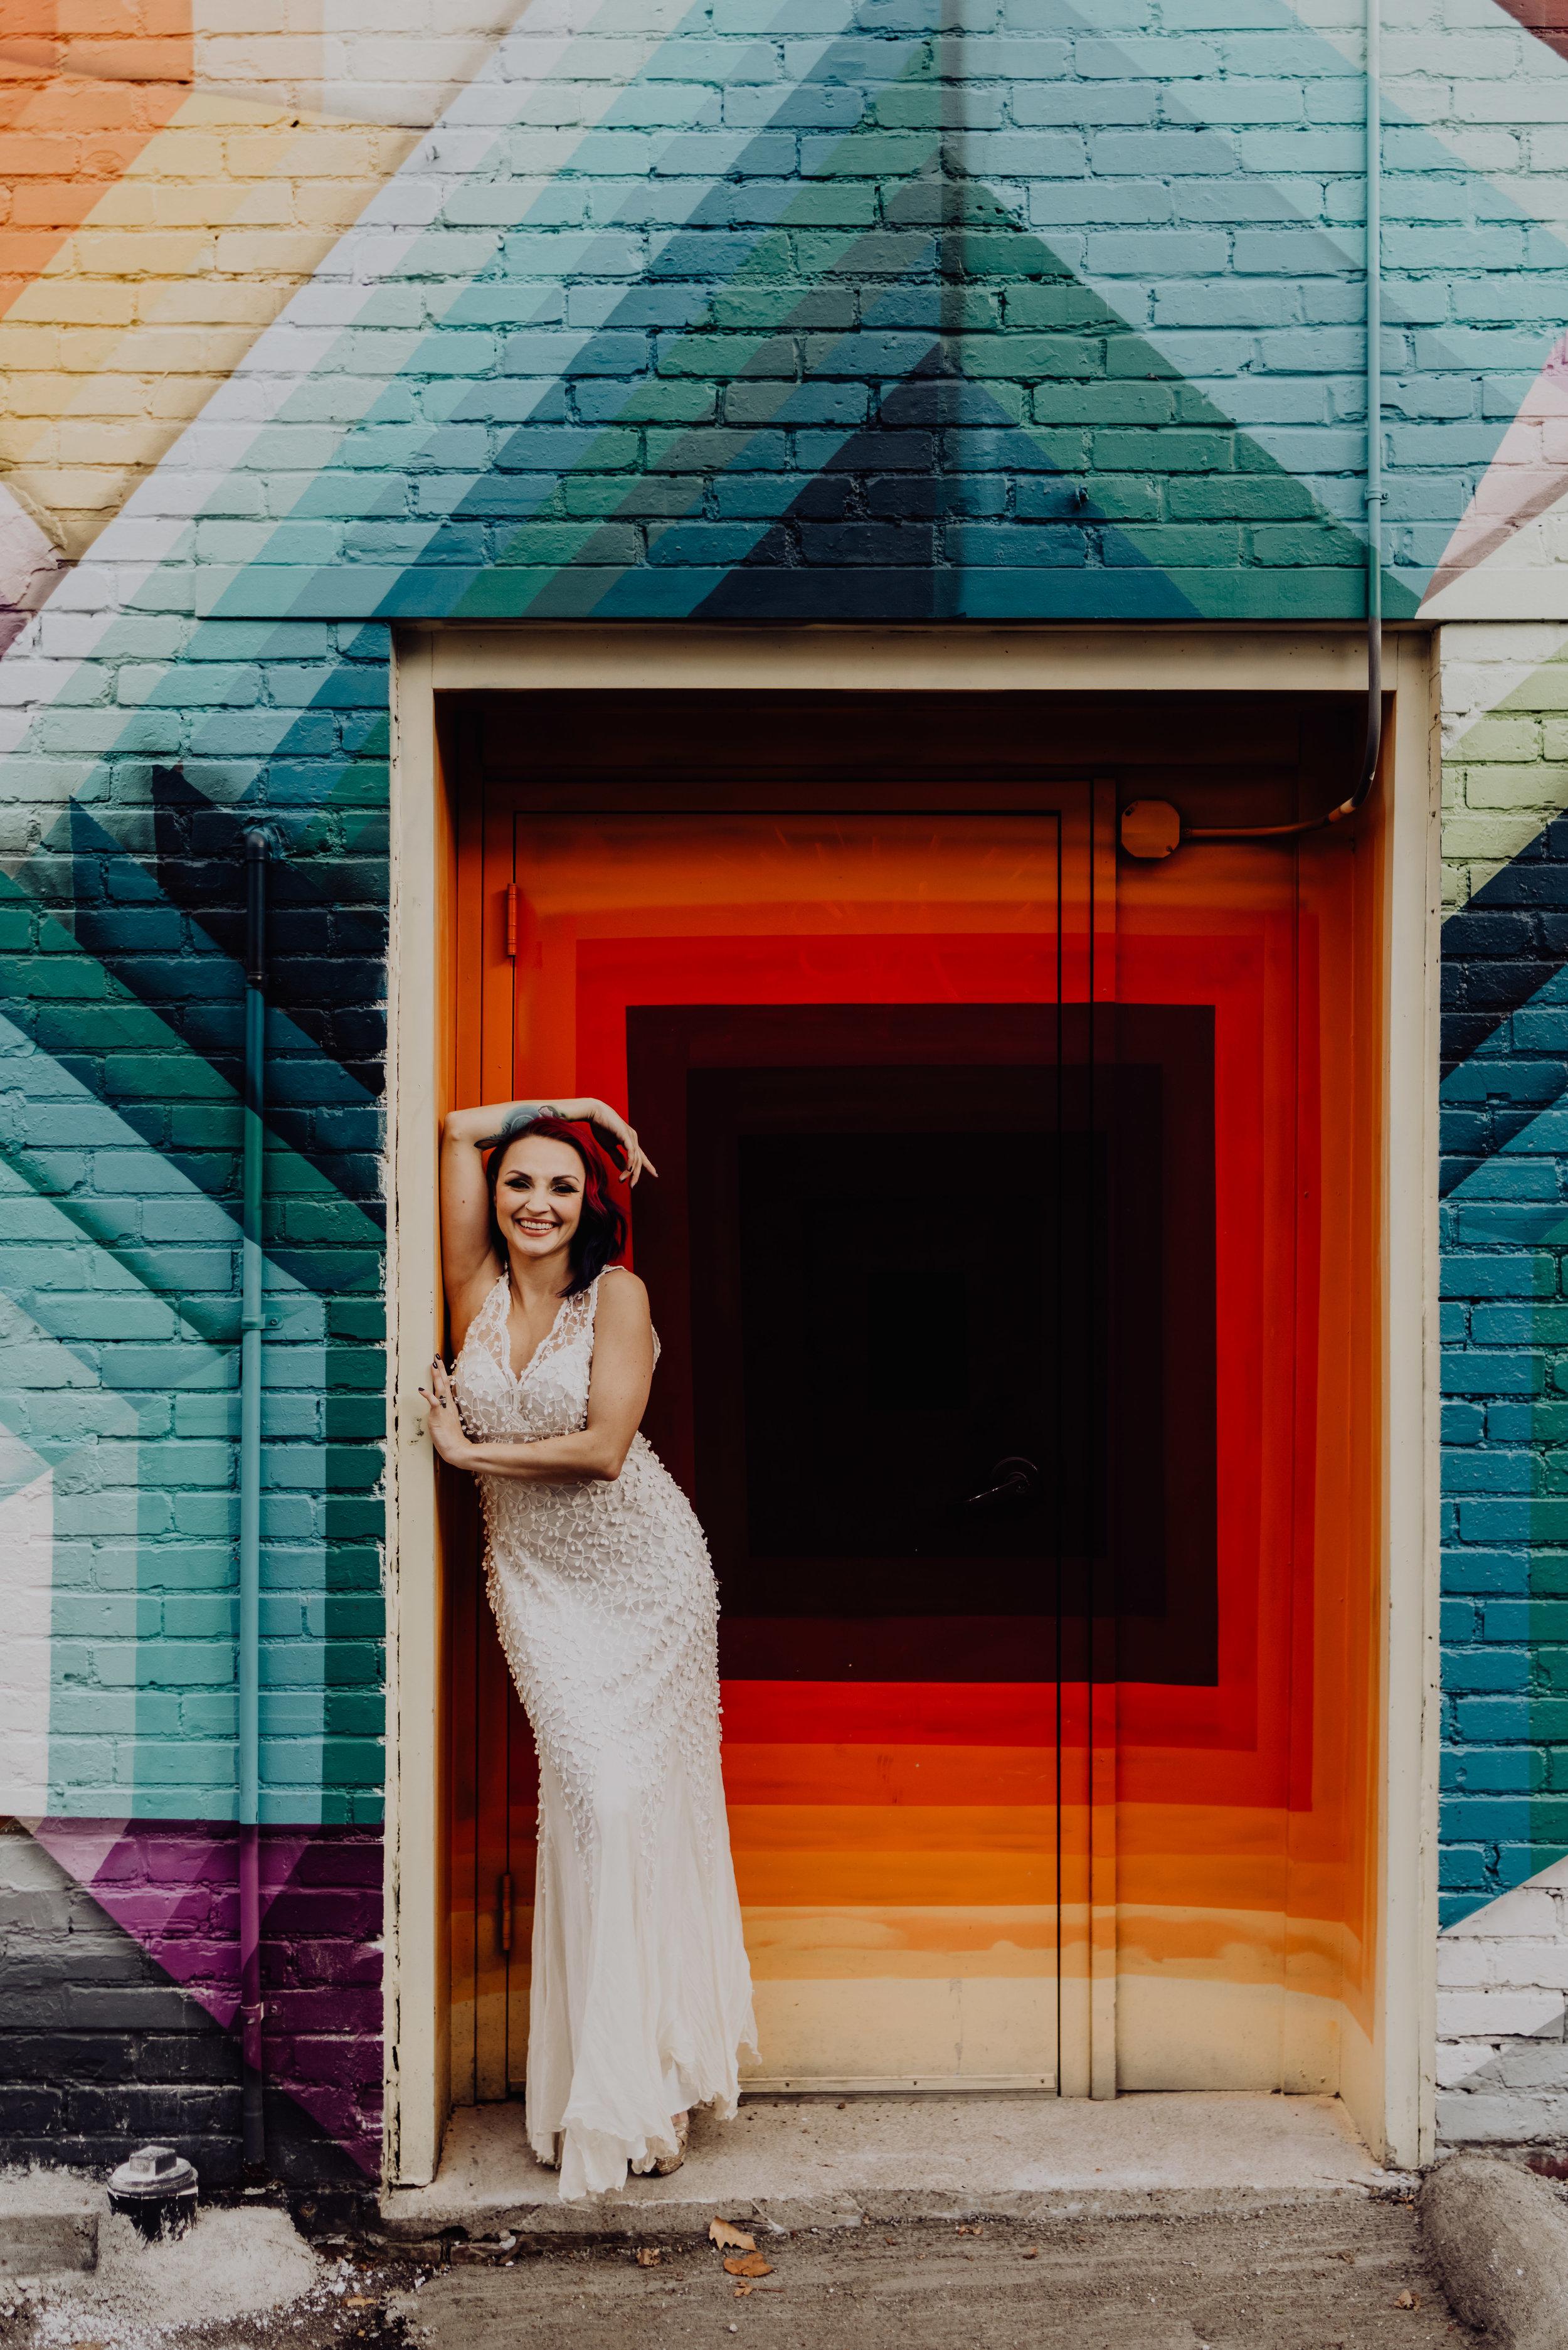 bonnie styled bridal portraits by wilde company-27.jpg